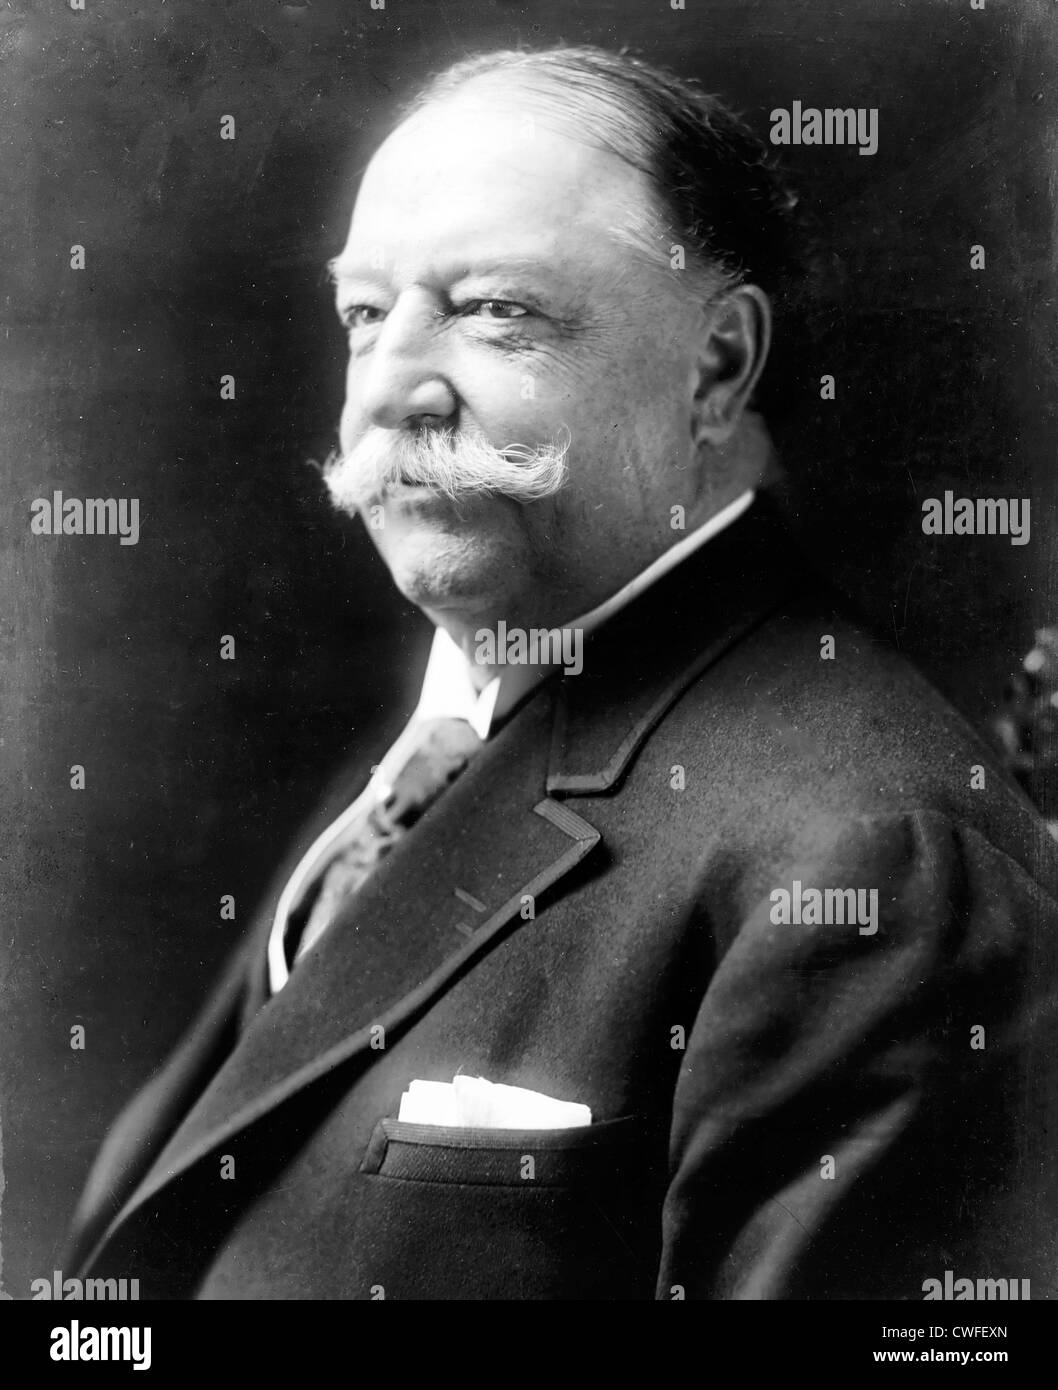 William Howard Taft, head-and-shoulders portrait, facing left, cIrca 916 - Stock Image